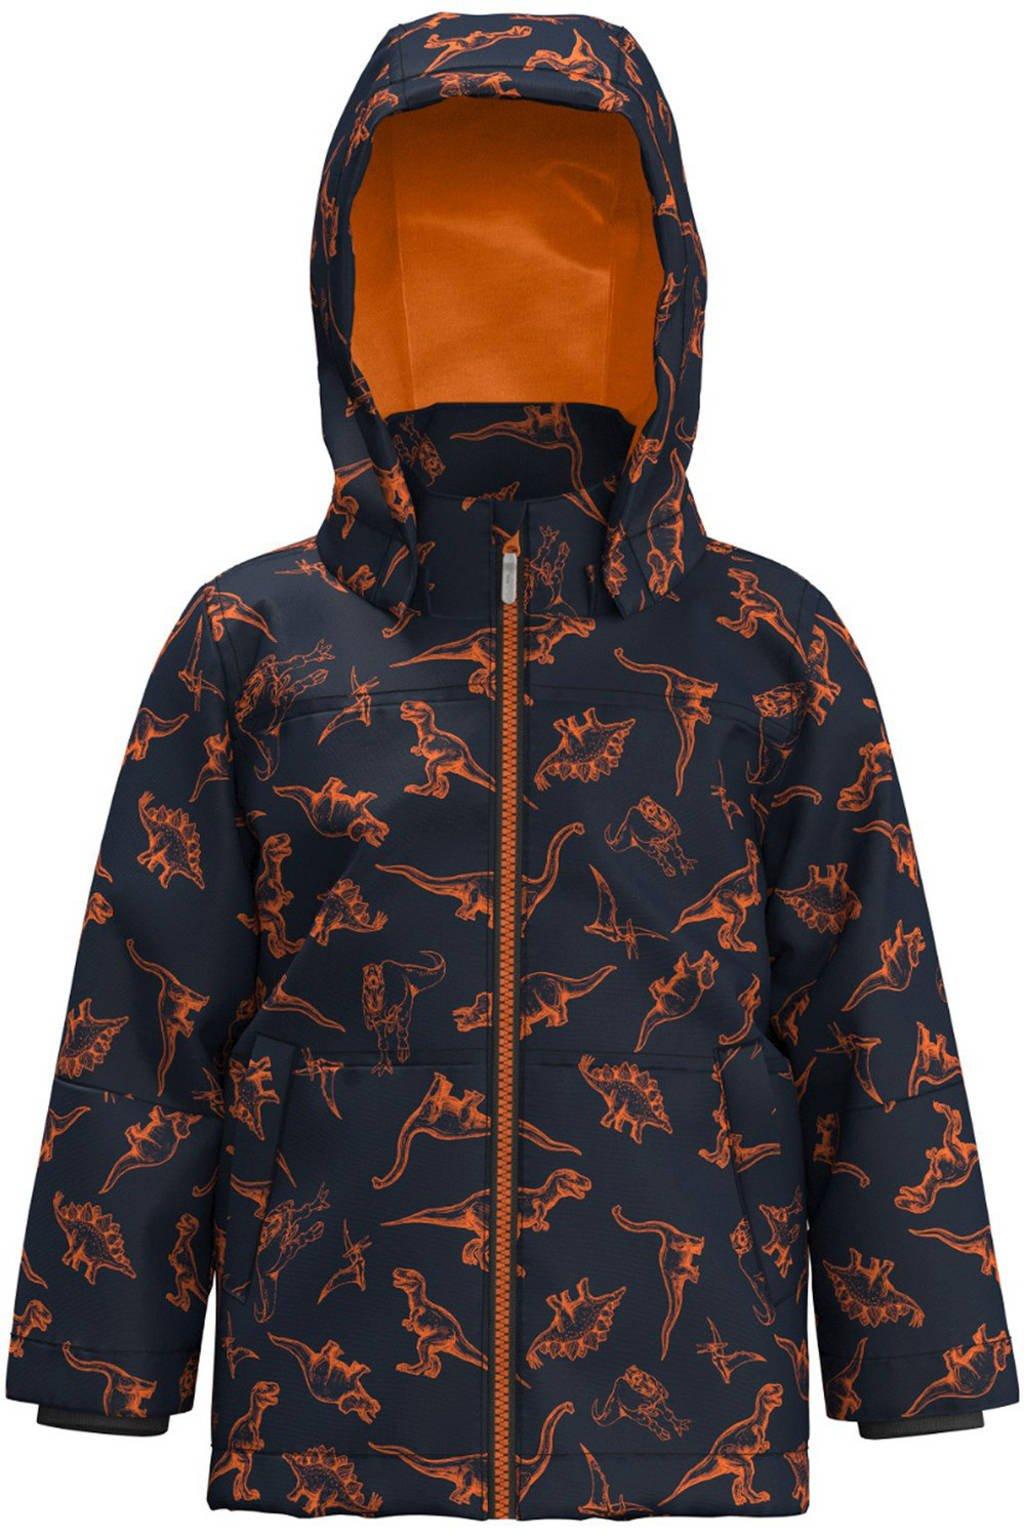 NAME IT MINI zomerjas Max met dierenprint donkerblauw/oranje, Donkerblauw/oranje